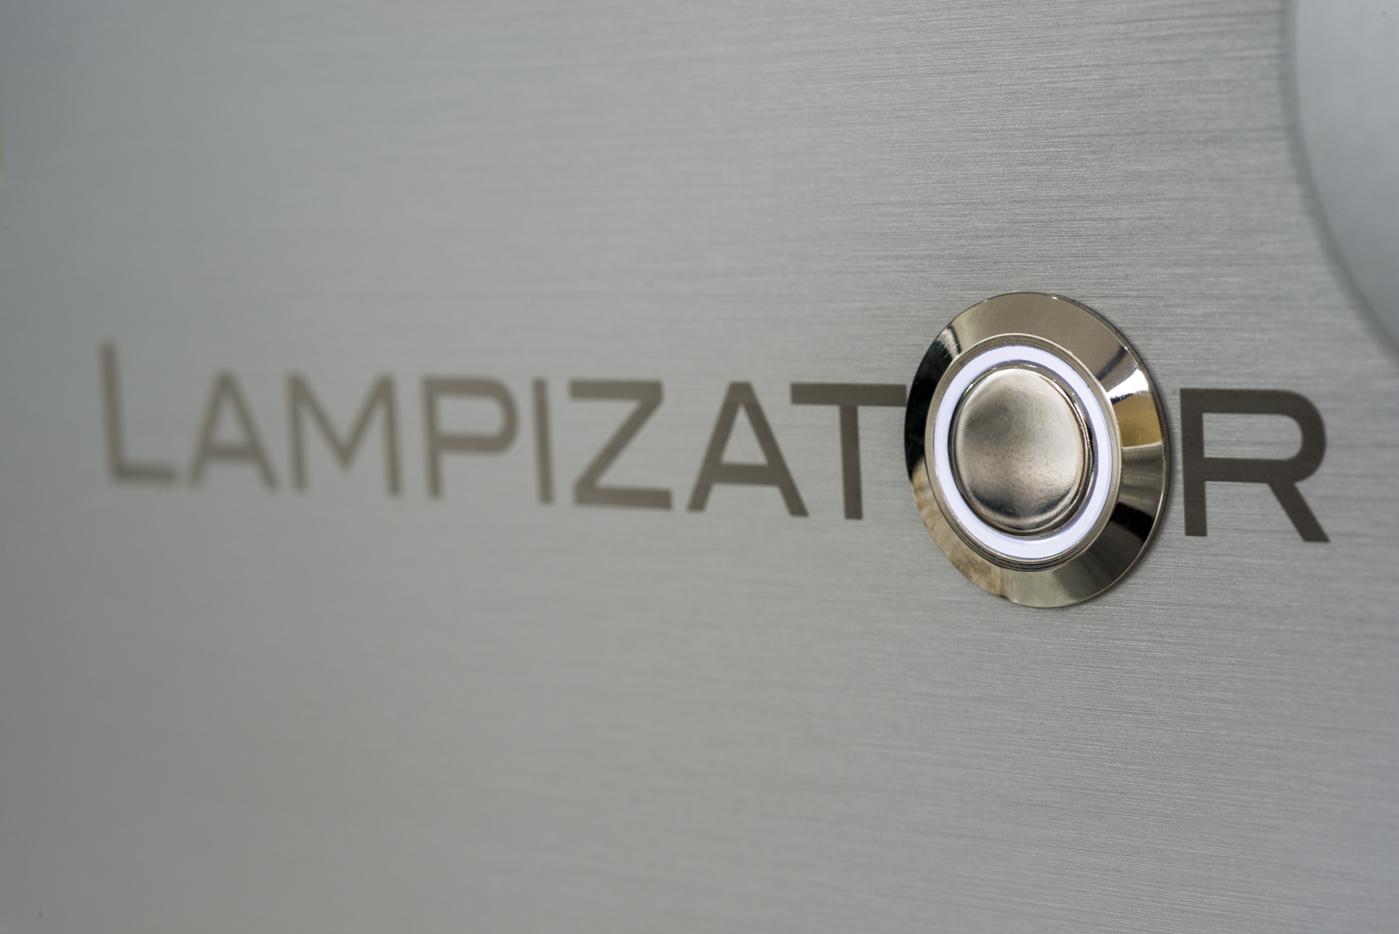 lampizator-dac-7-lite-preamp-valve-002.jpg